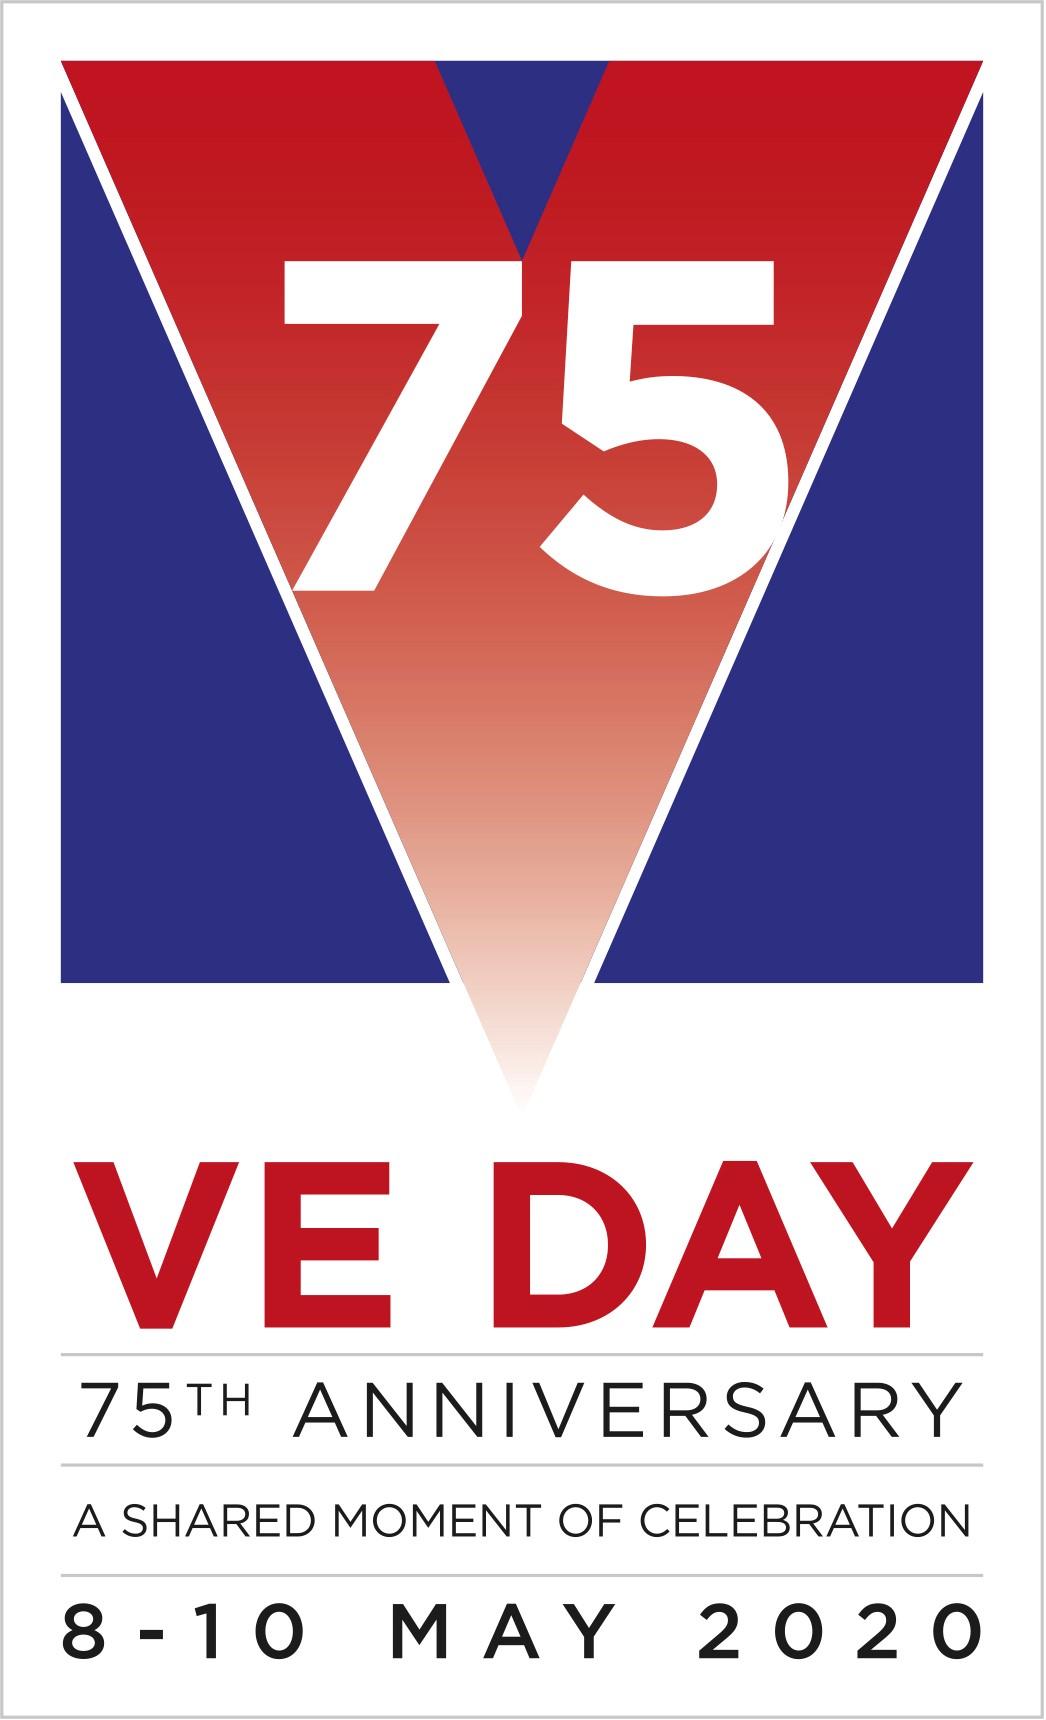 The VE Day 75 Logo